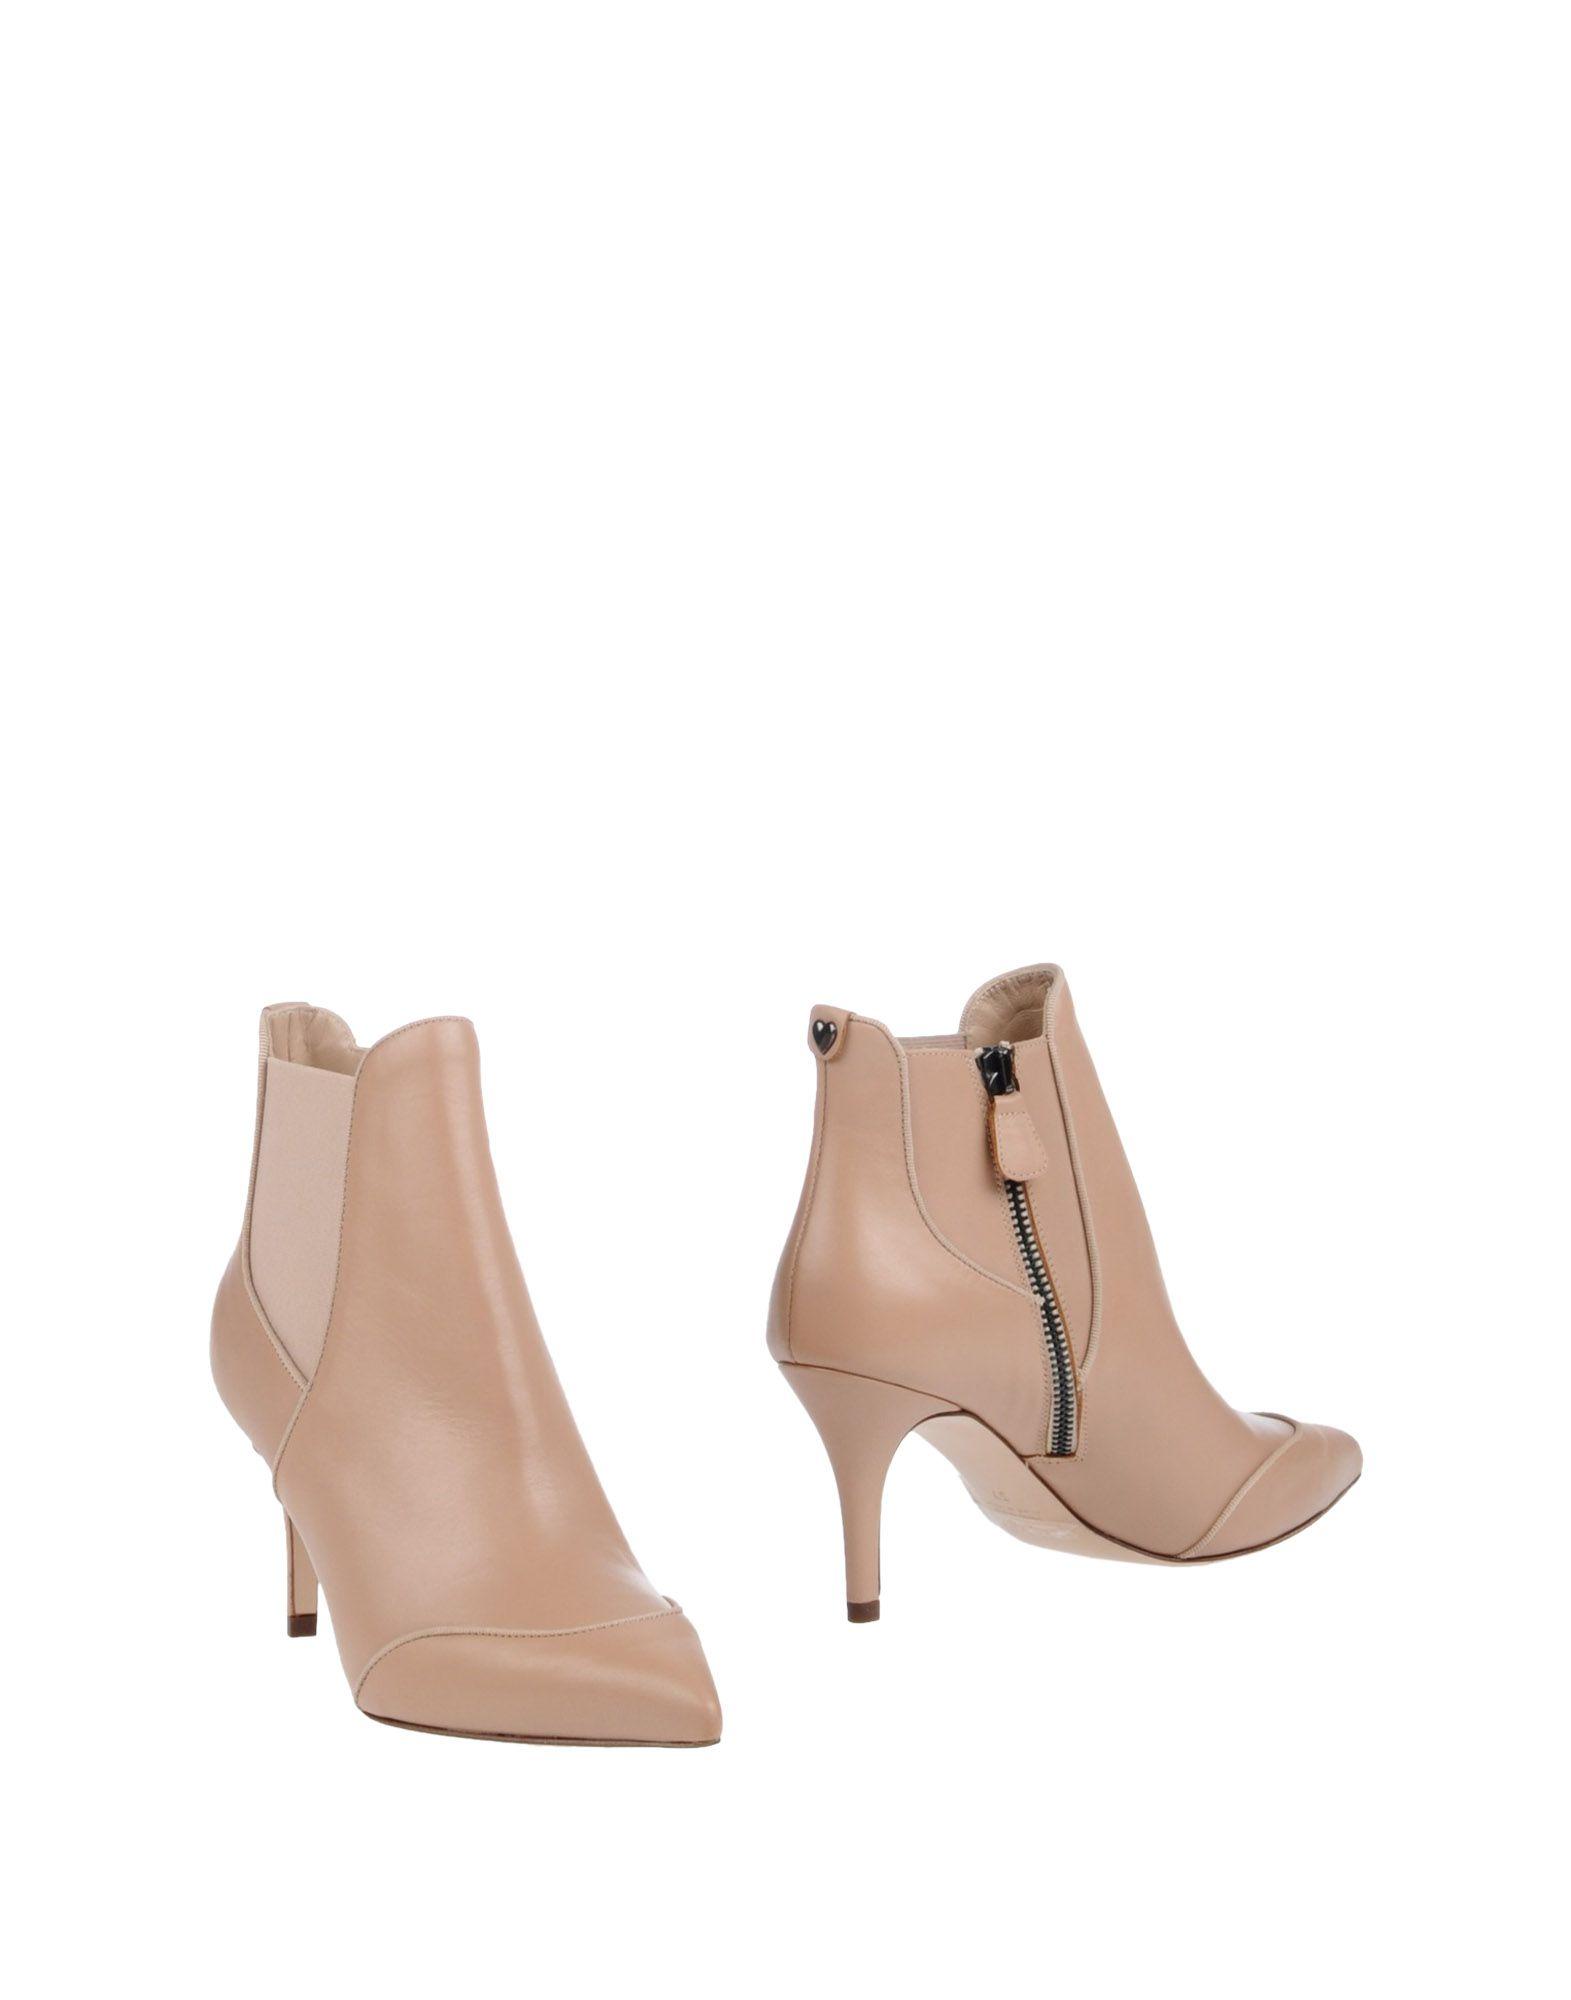 Haltbare Mode Beliebte billige Schuhe Twin 11245497NM Beliebte Mode Schuhe da62b6